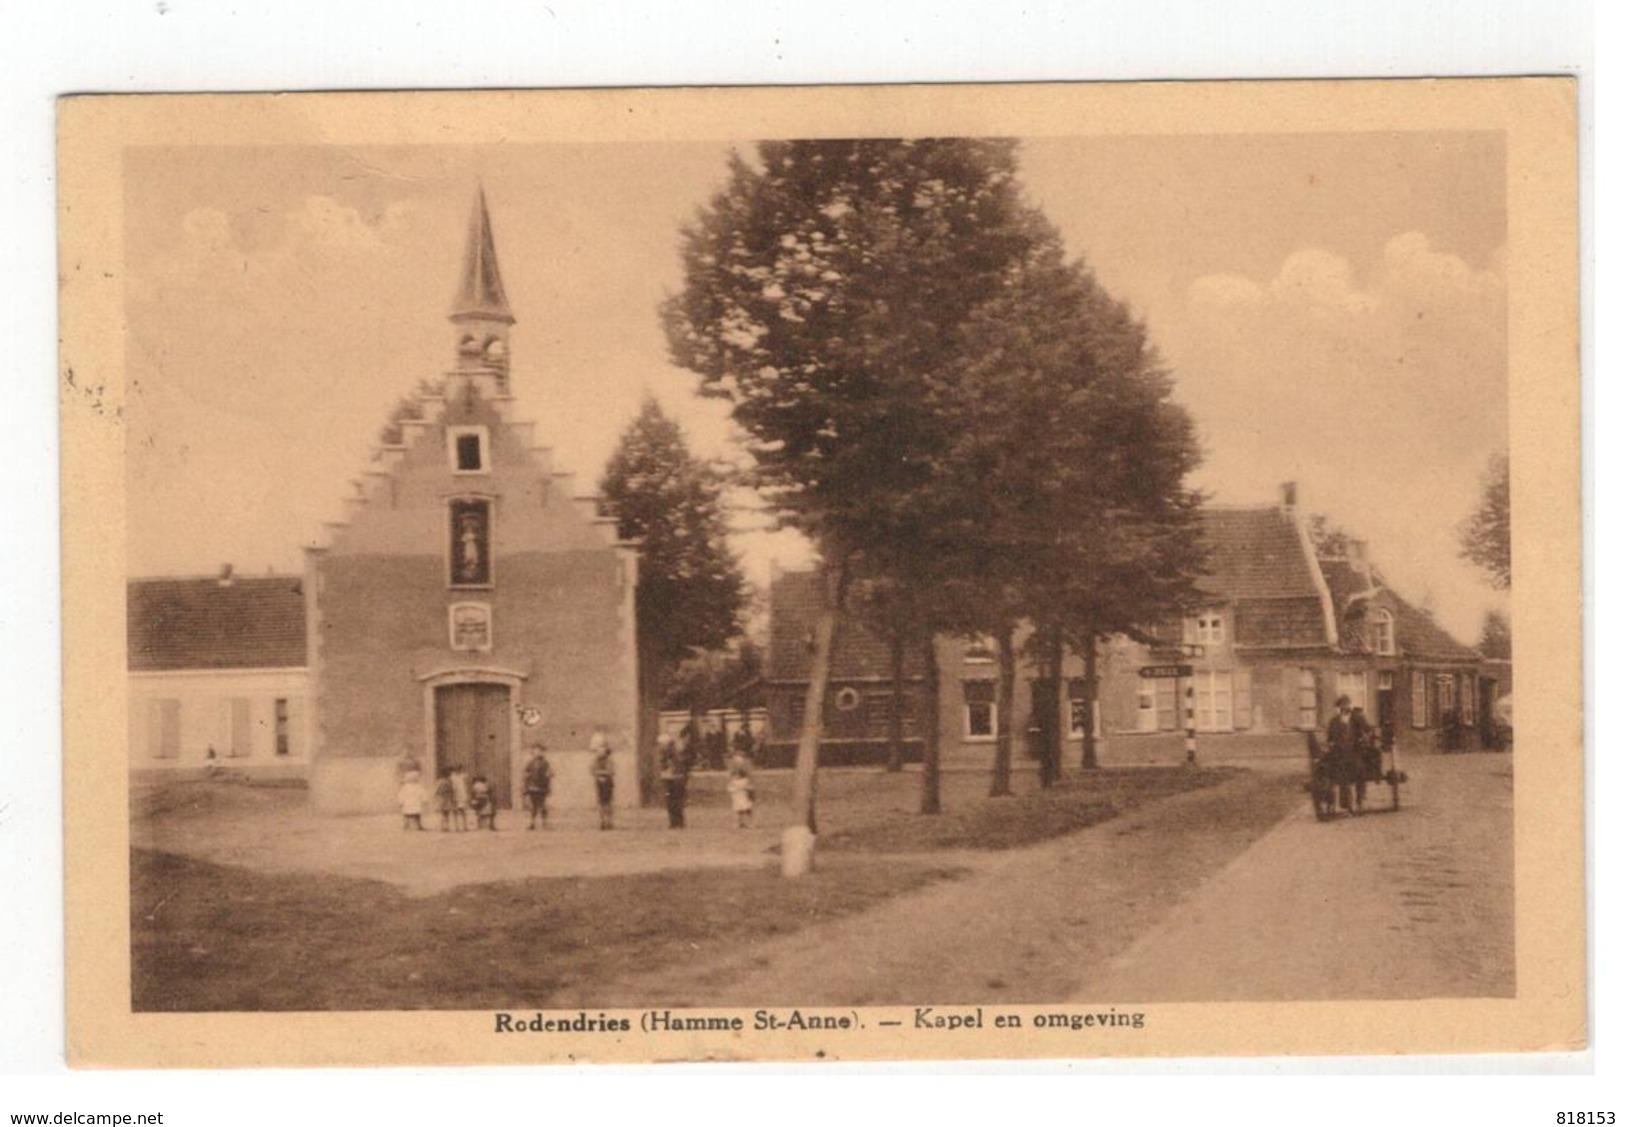 Rodendries  (Hamme St-Anne) - Kapel En Omgeving - Hamme